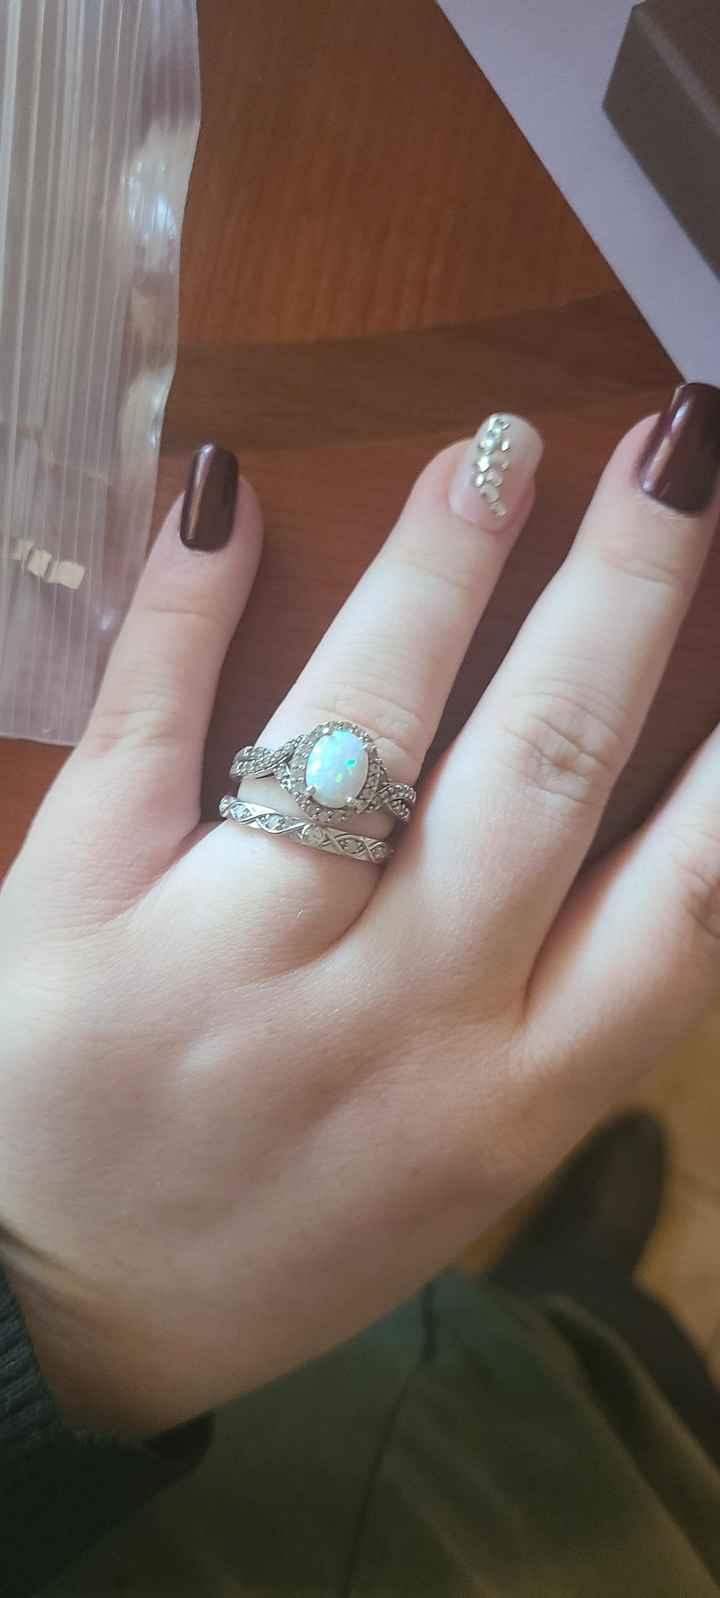 Has anyone had a ring made by custommade.com 2